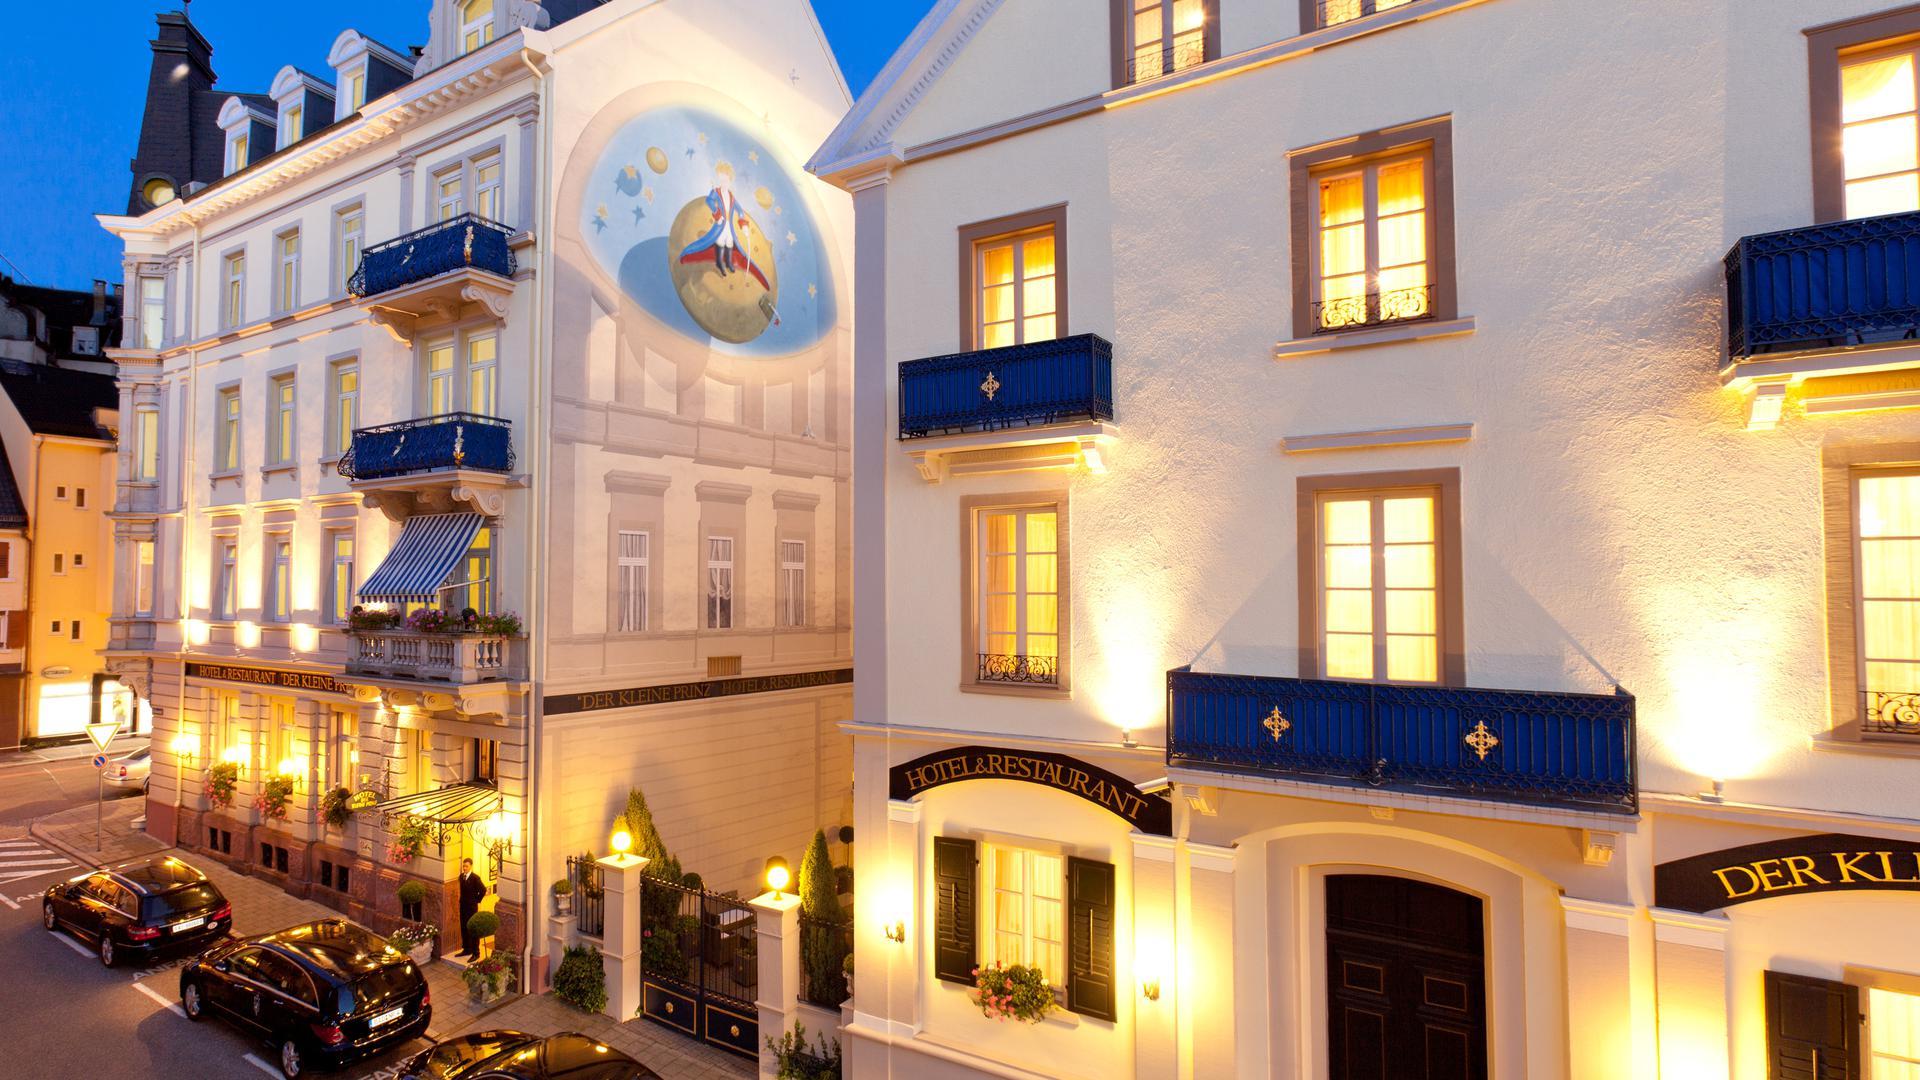 Fassadengemälde Hotel Kleiner Prinz